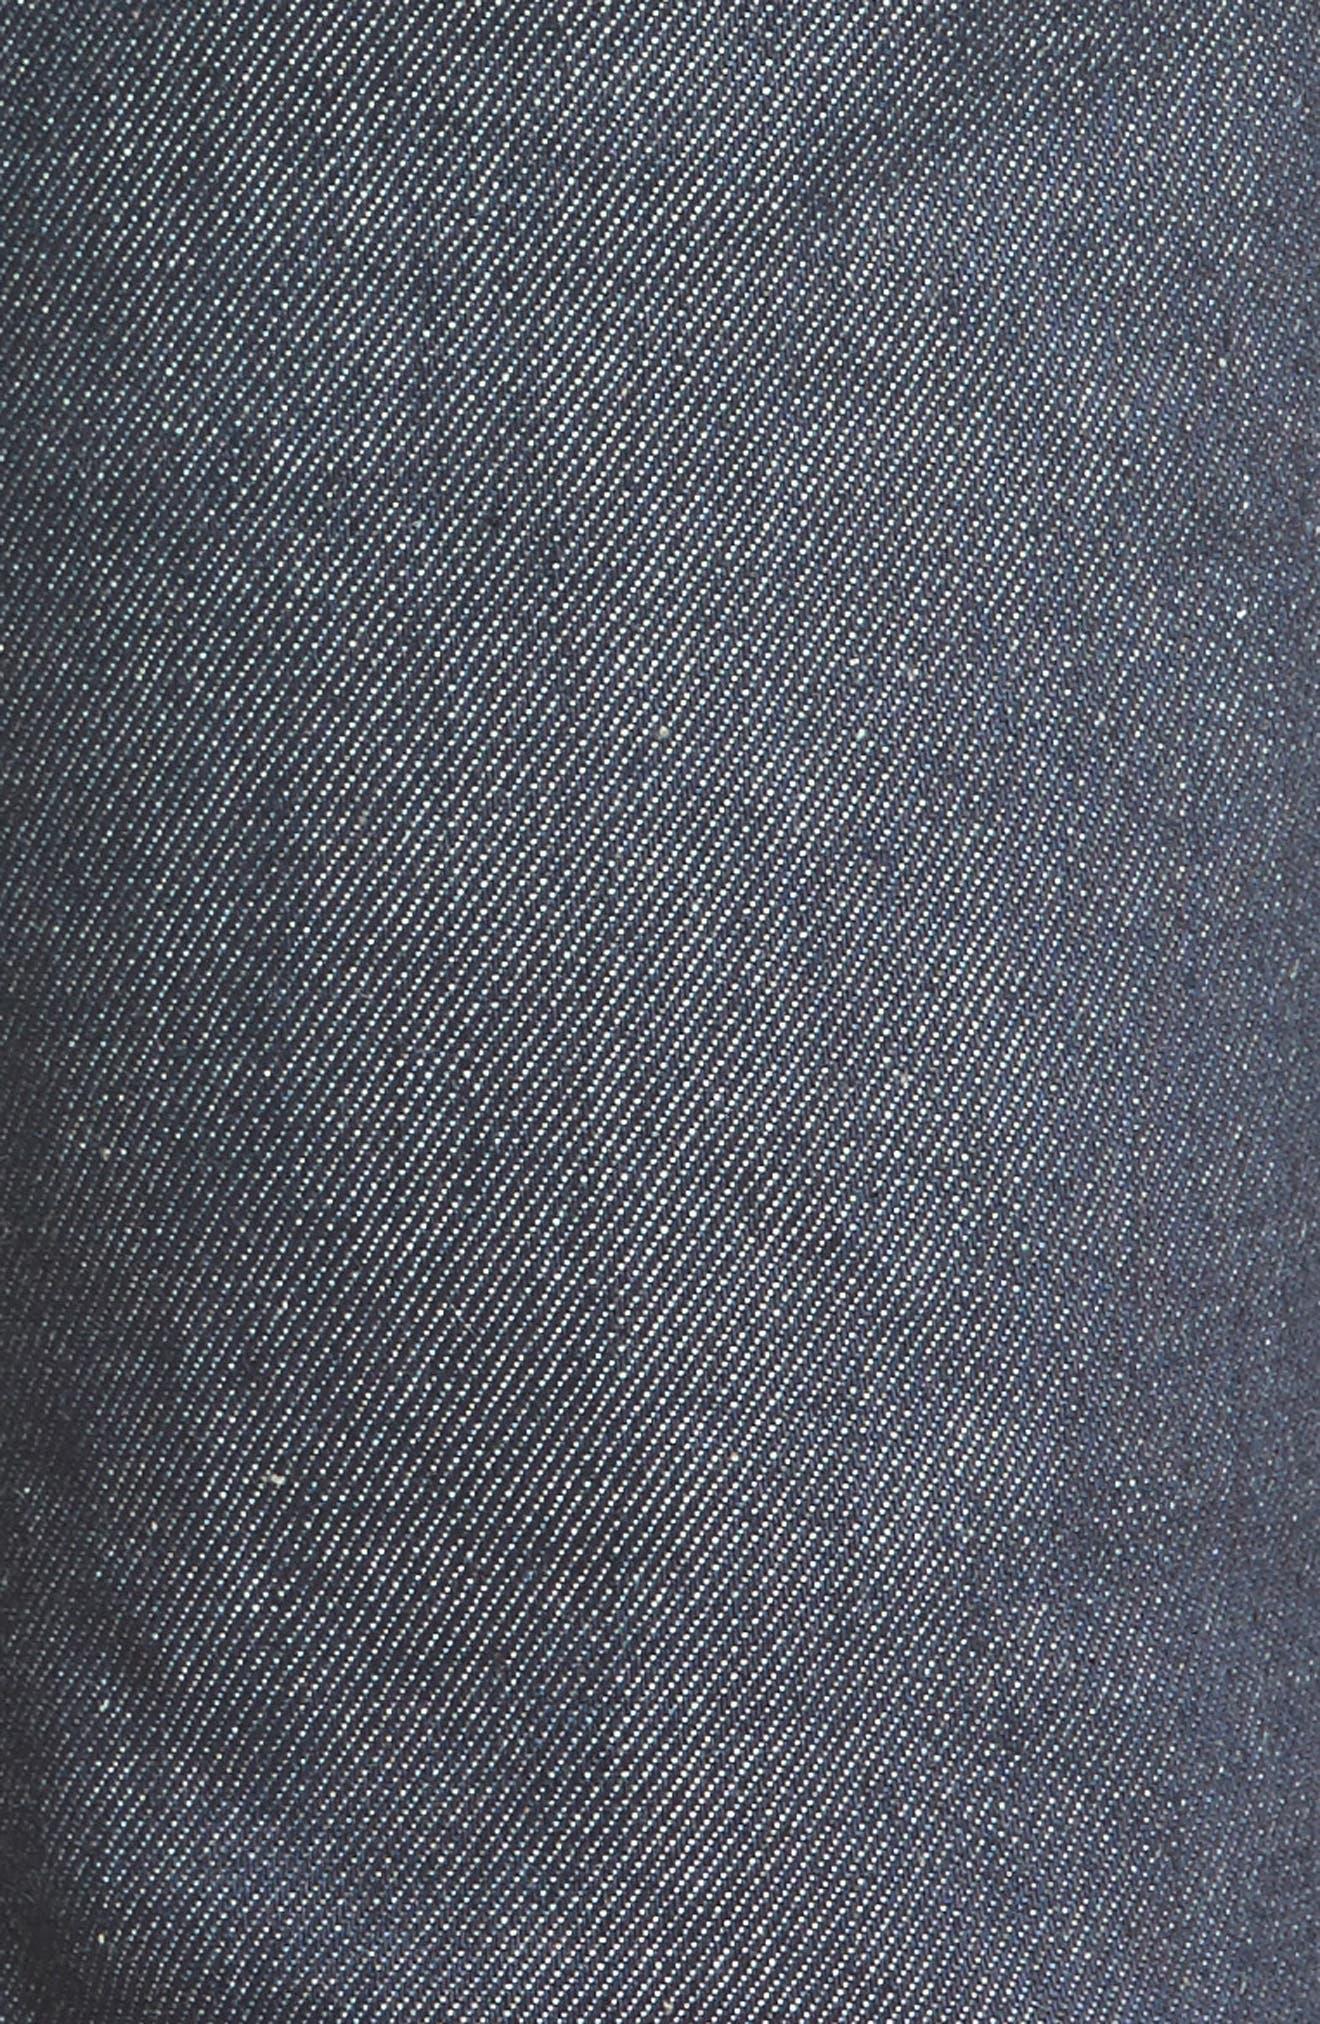 North Skinny Jeans,                             Alternate thumbnail 5, color,                             INDIGO